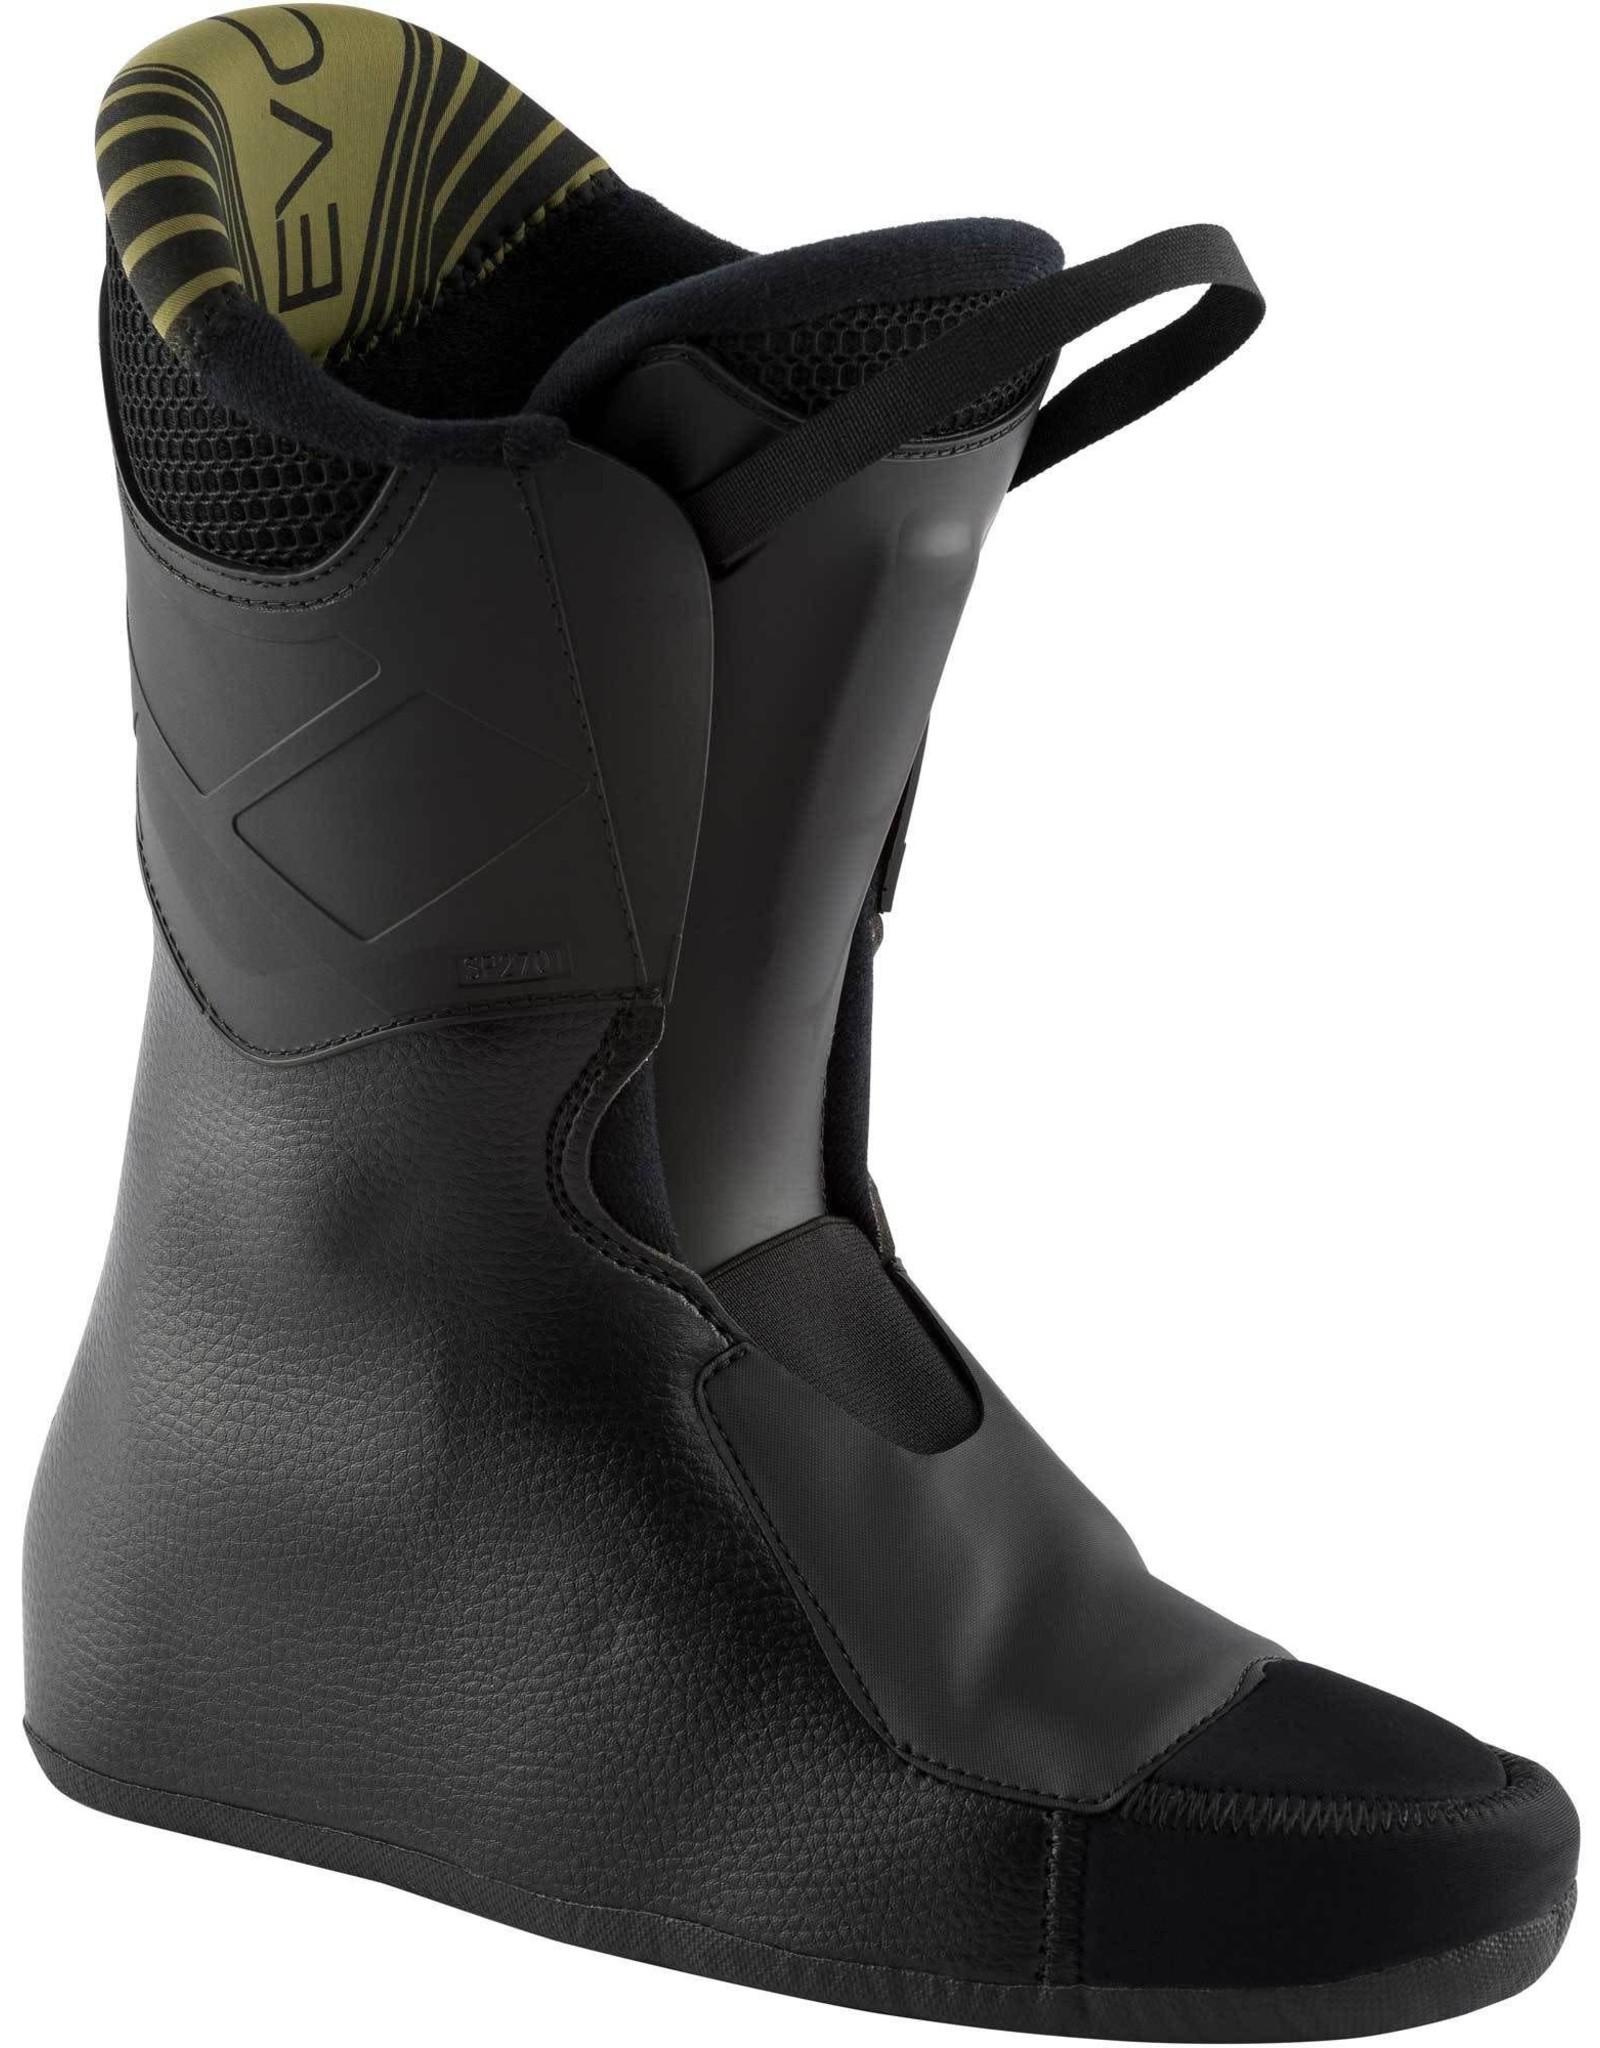 ROSSIGNOL Rossignol EVO 70 men alpine ski boot blk-khaki 22